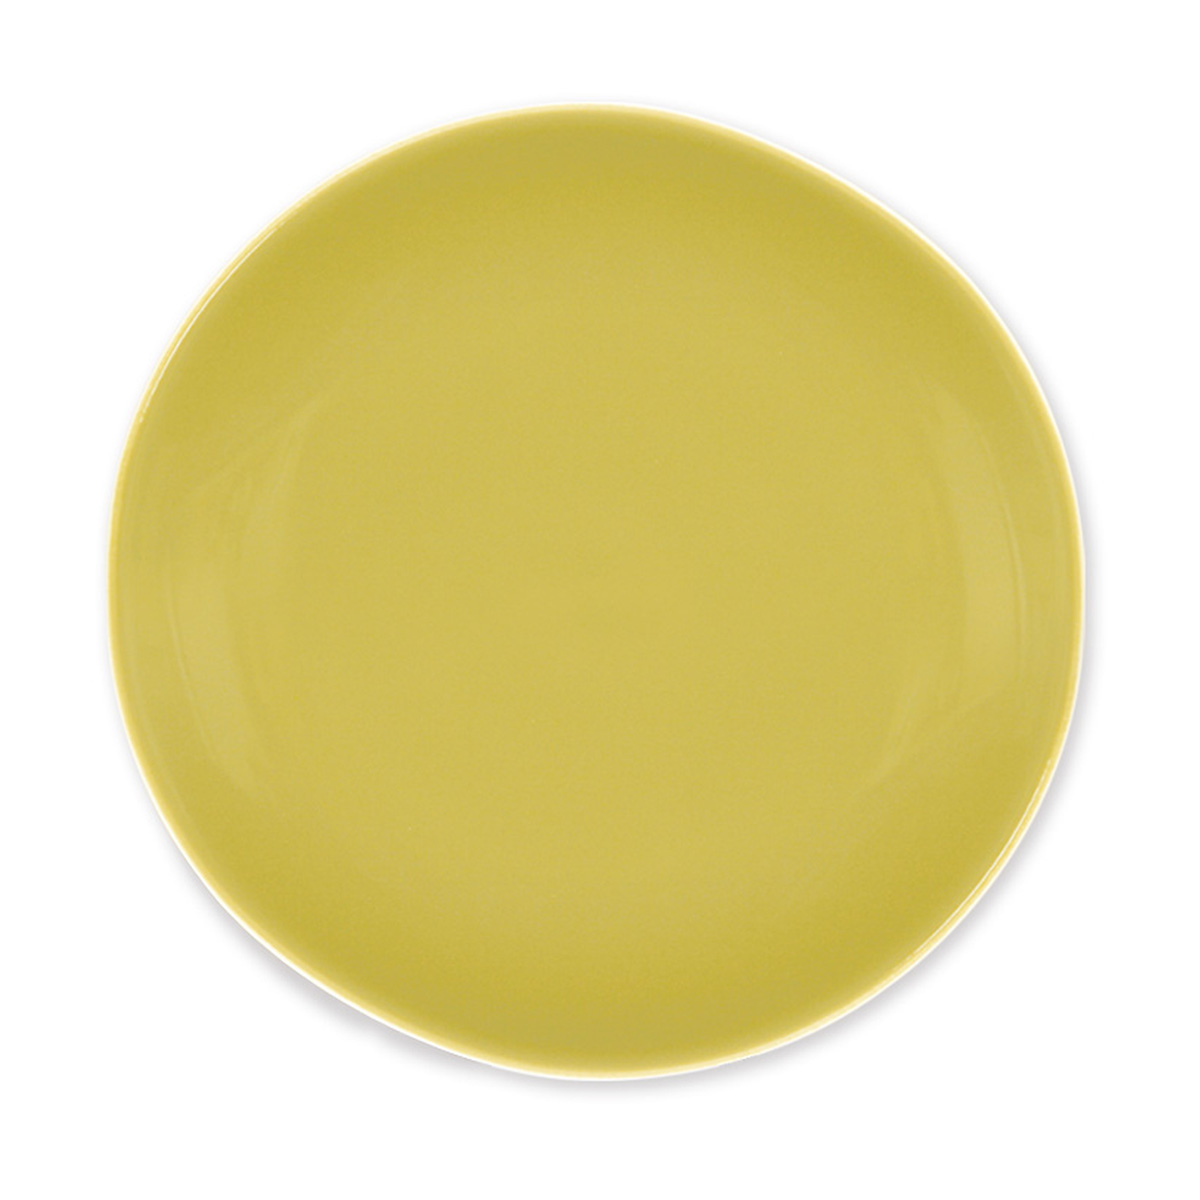 Idee Deco couleur vert anis : Assiette à Dessert en Faïence - Couleur Vert Anis - Vaisselle Tendance